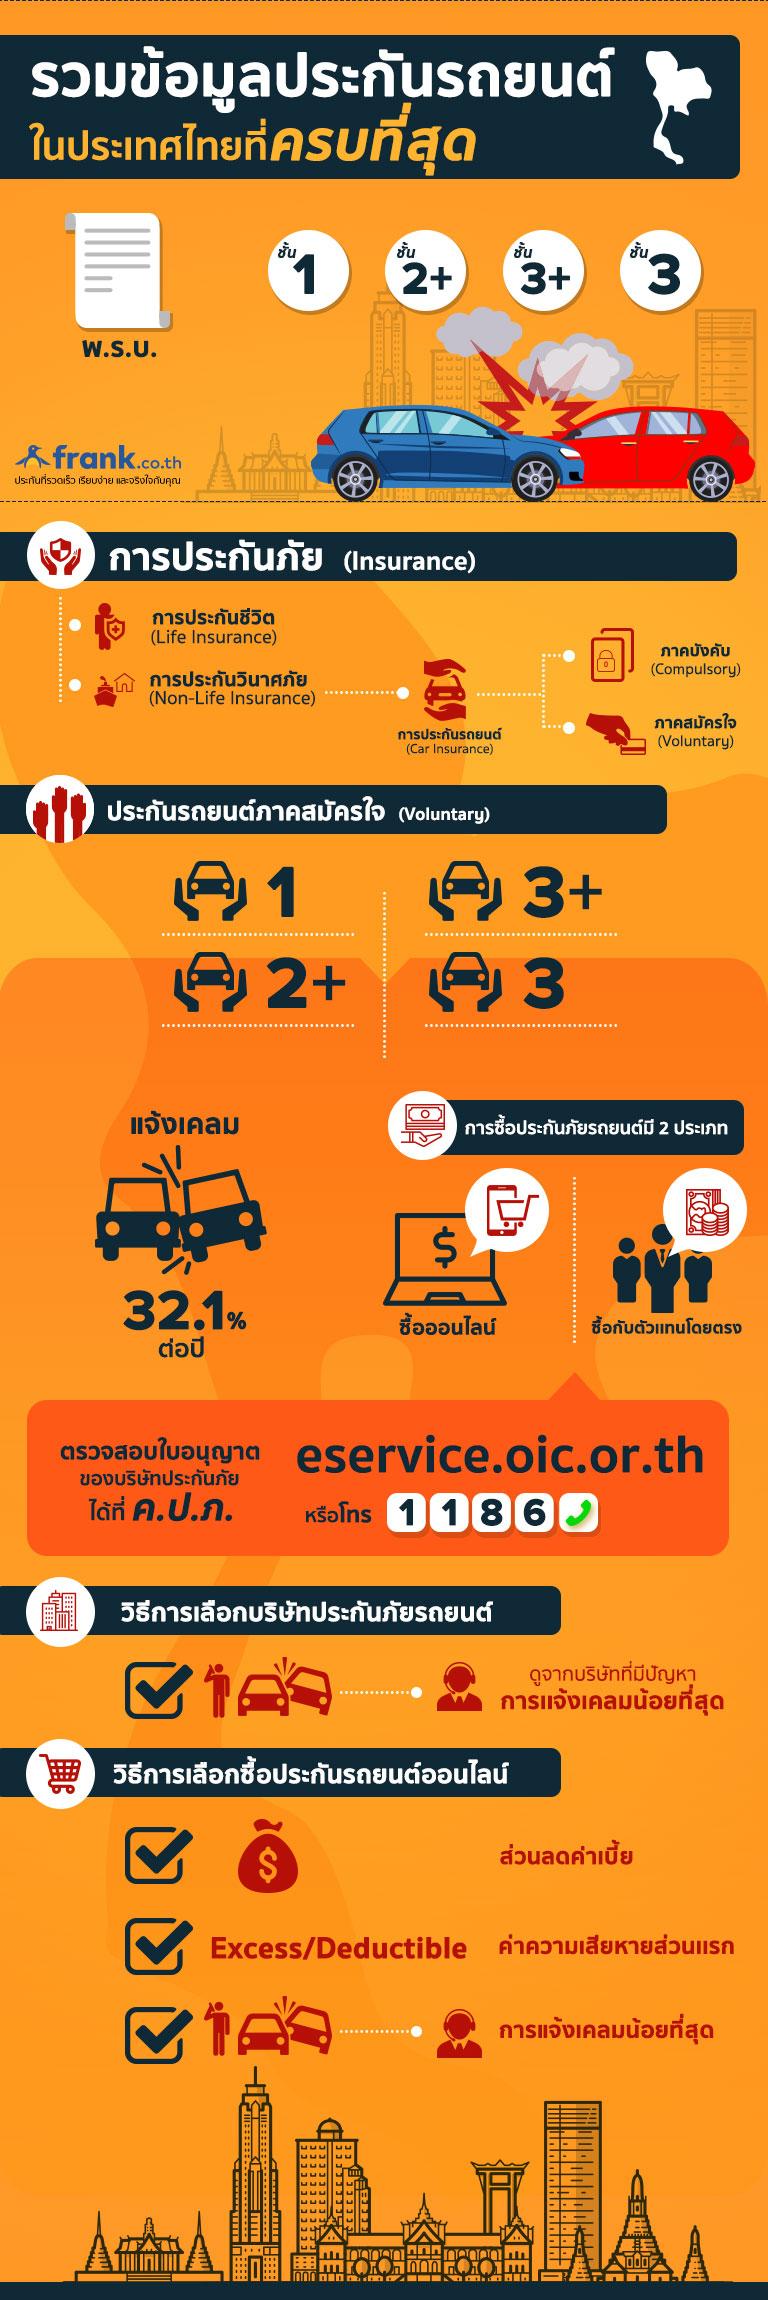 infographic-ข้อมูล-ประกันรถยนต์-ประเทศไทย-ที่ครบสุด